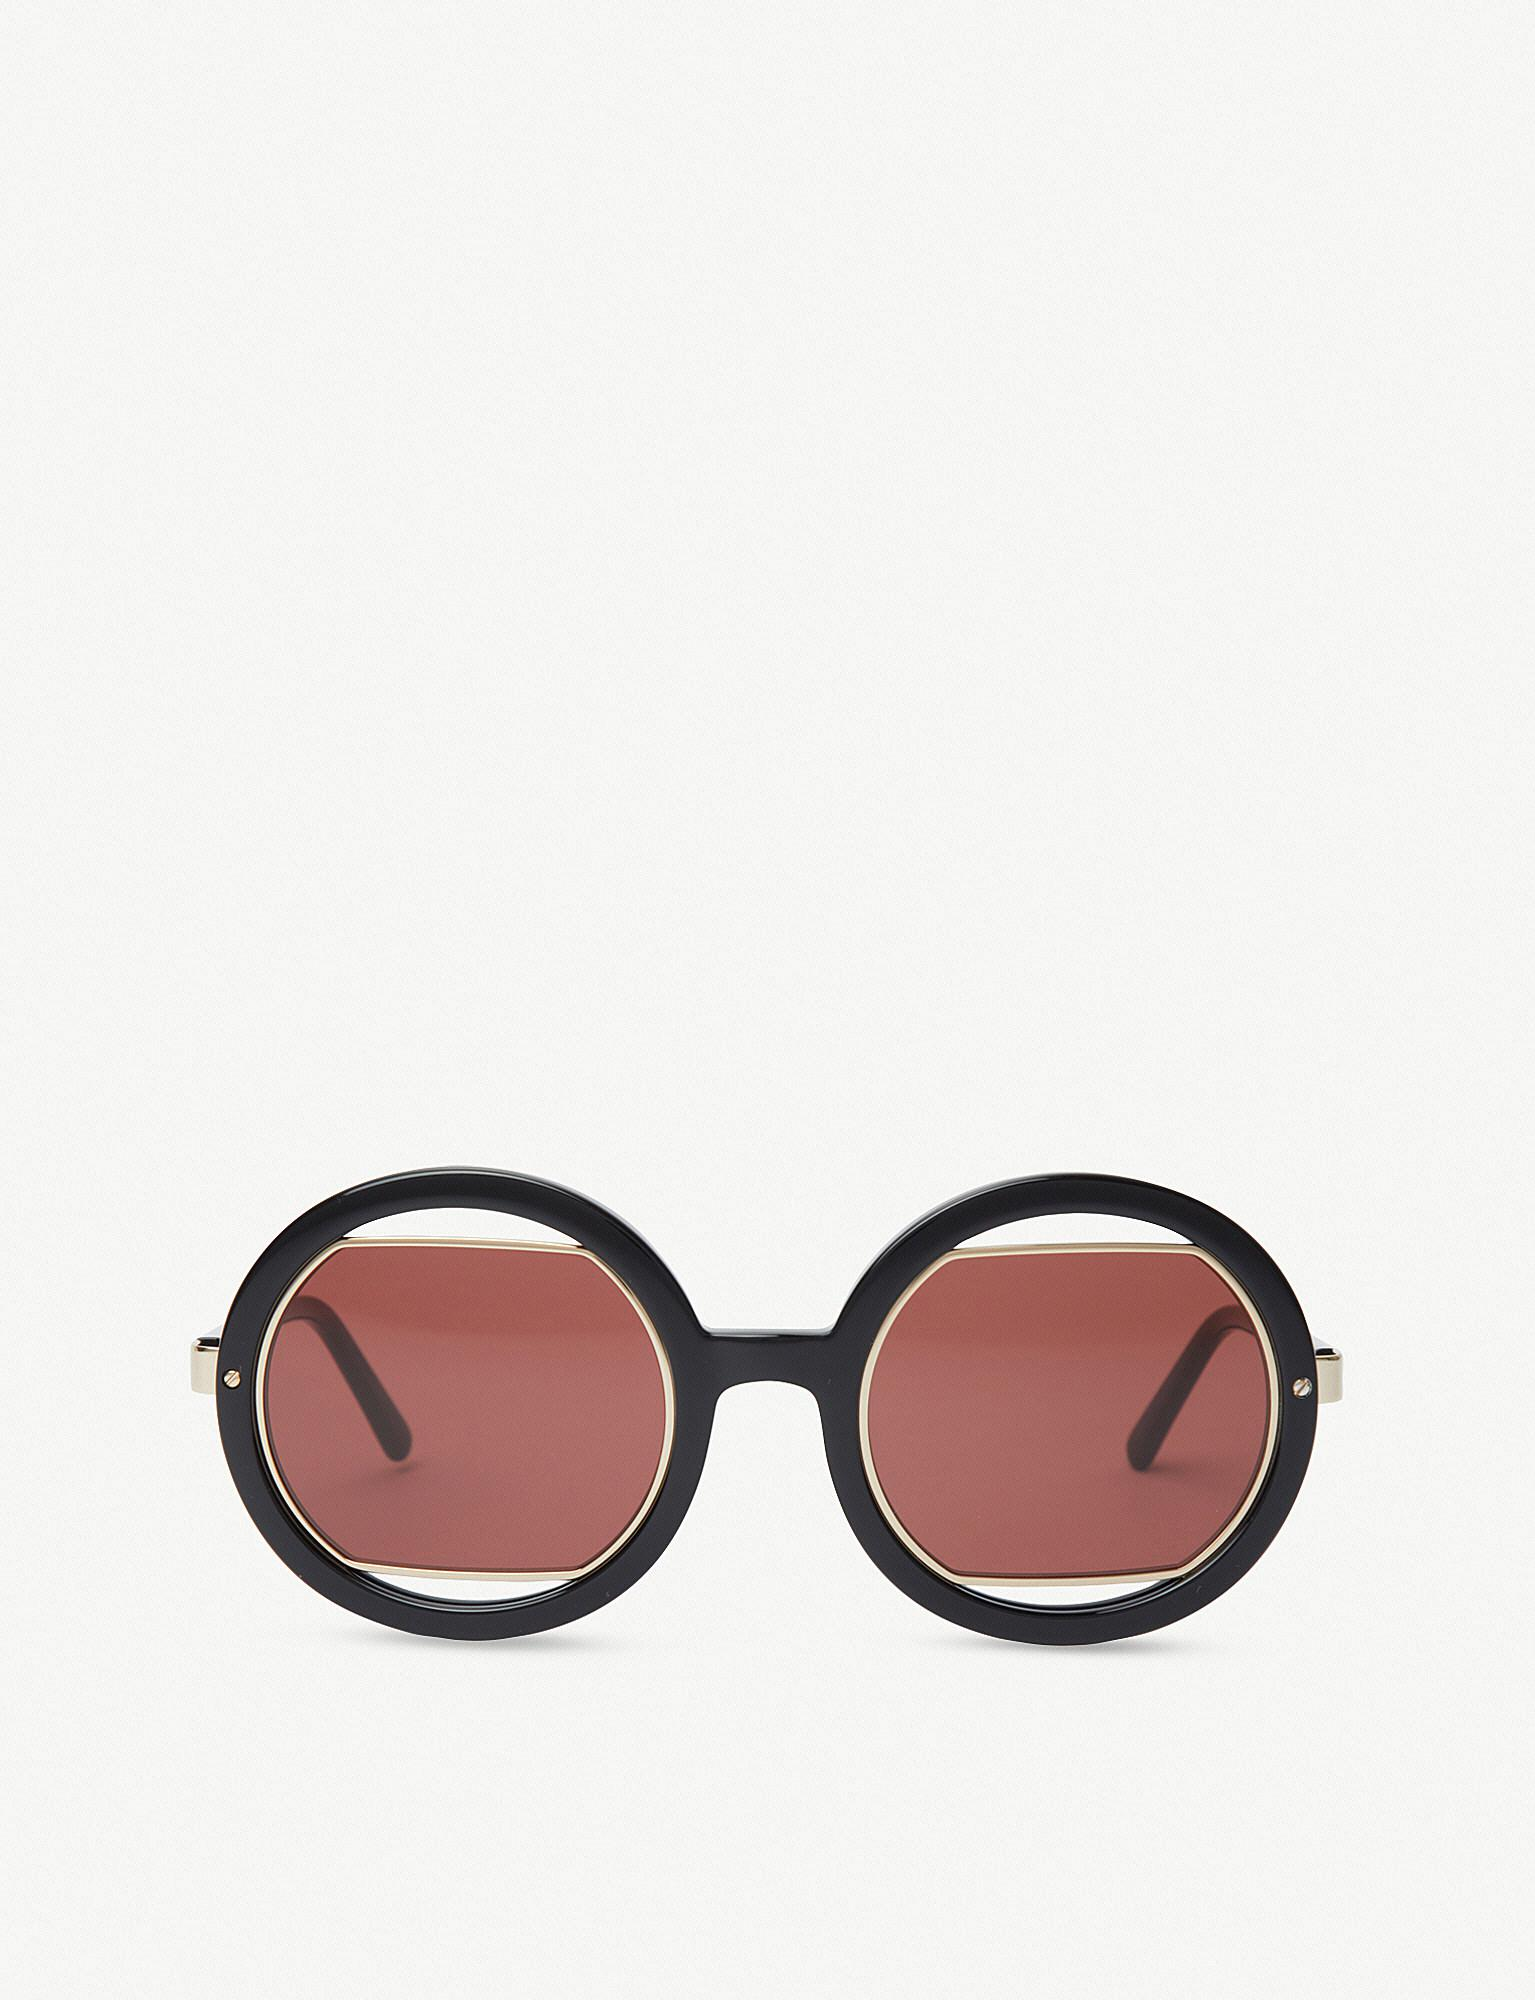 203d1beec03 Lyst - Marni Me623s Round-frame Acetate Sunglasses in Black